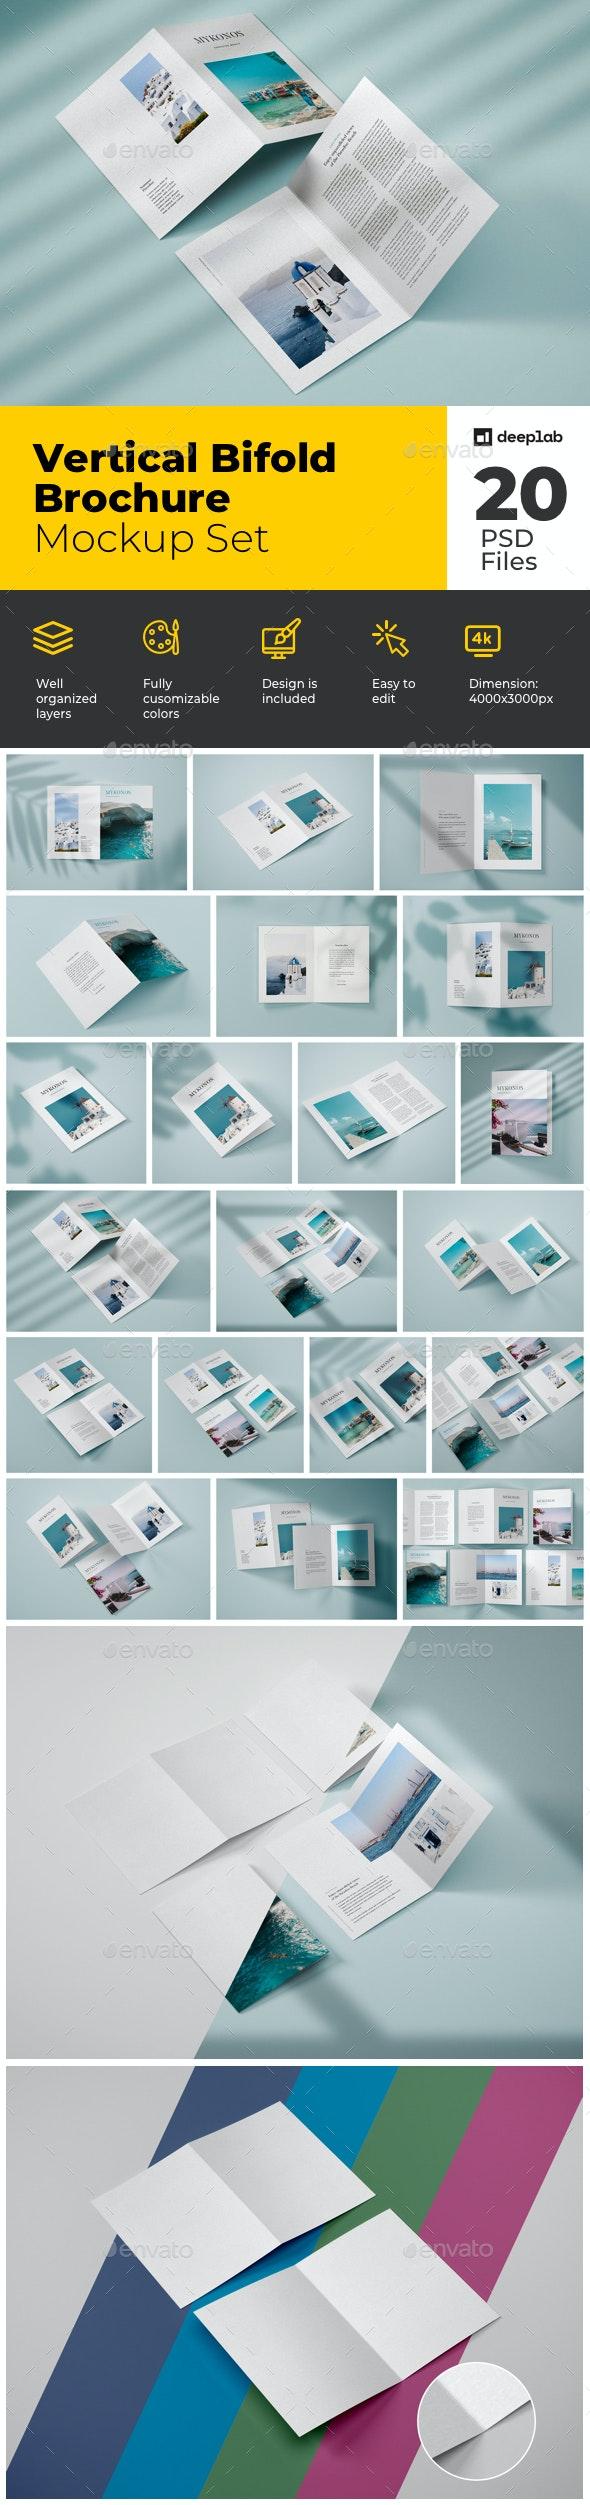 Vertical Bifold Brochure Mockup Set - Product Mock-Ups Graphics